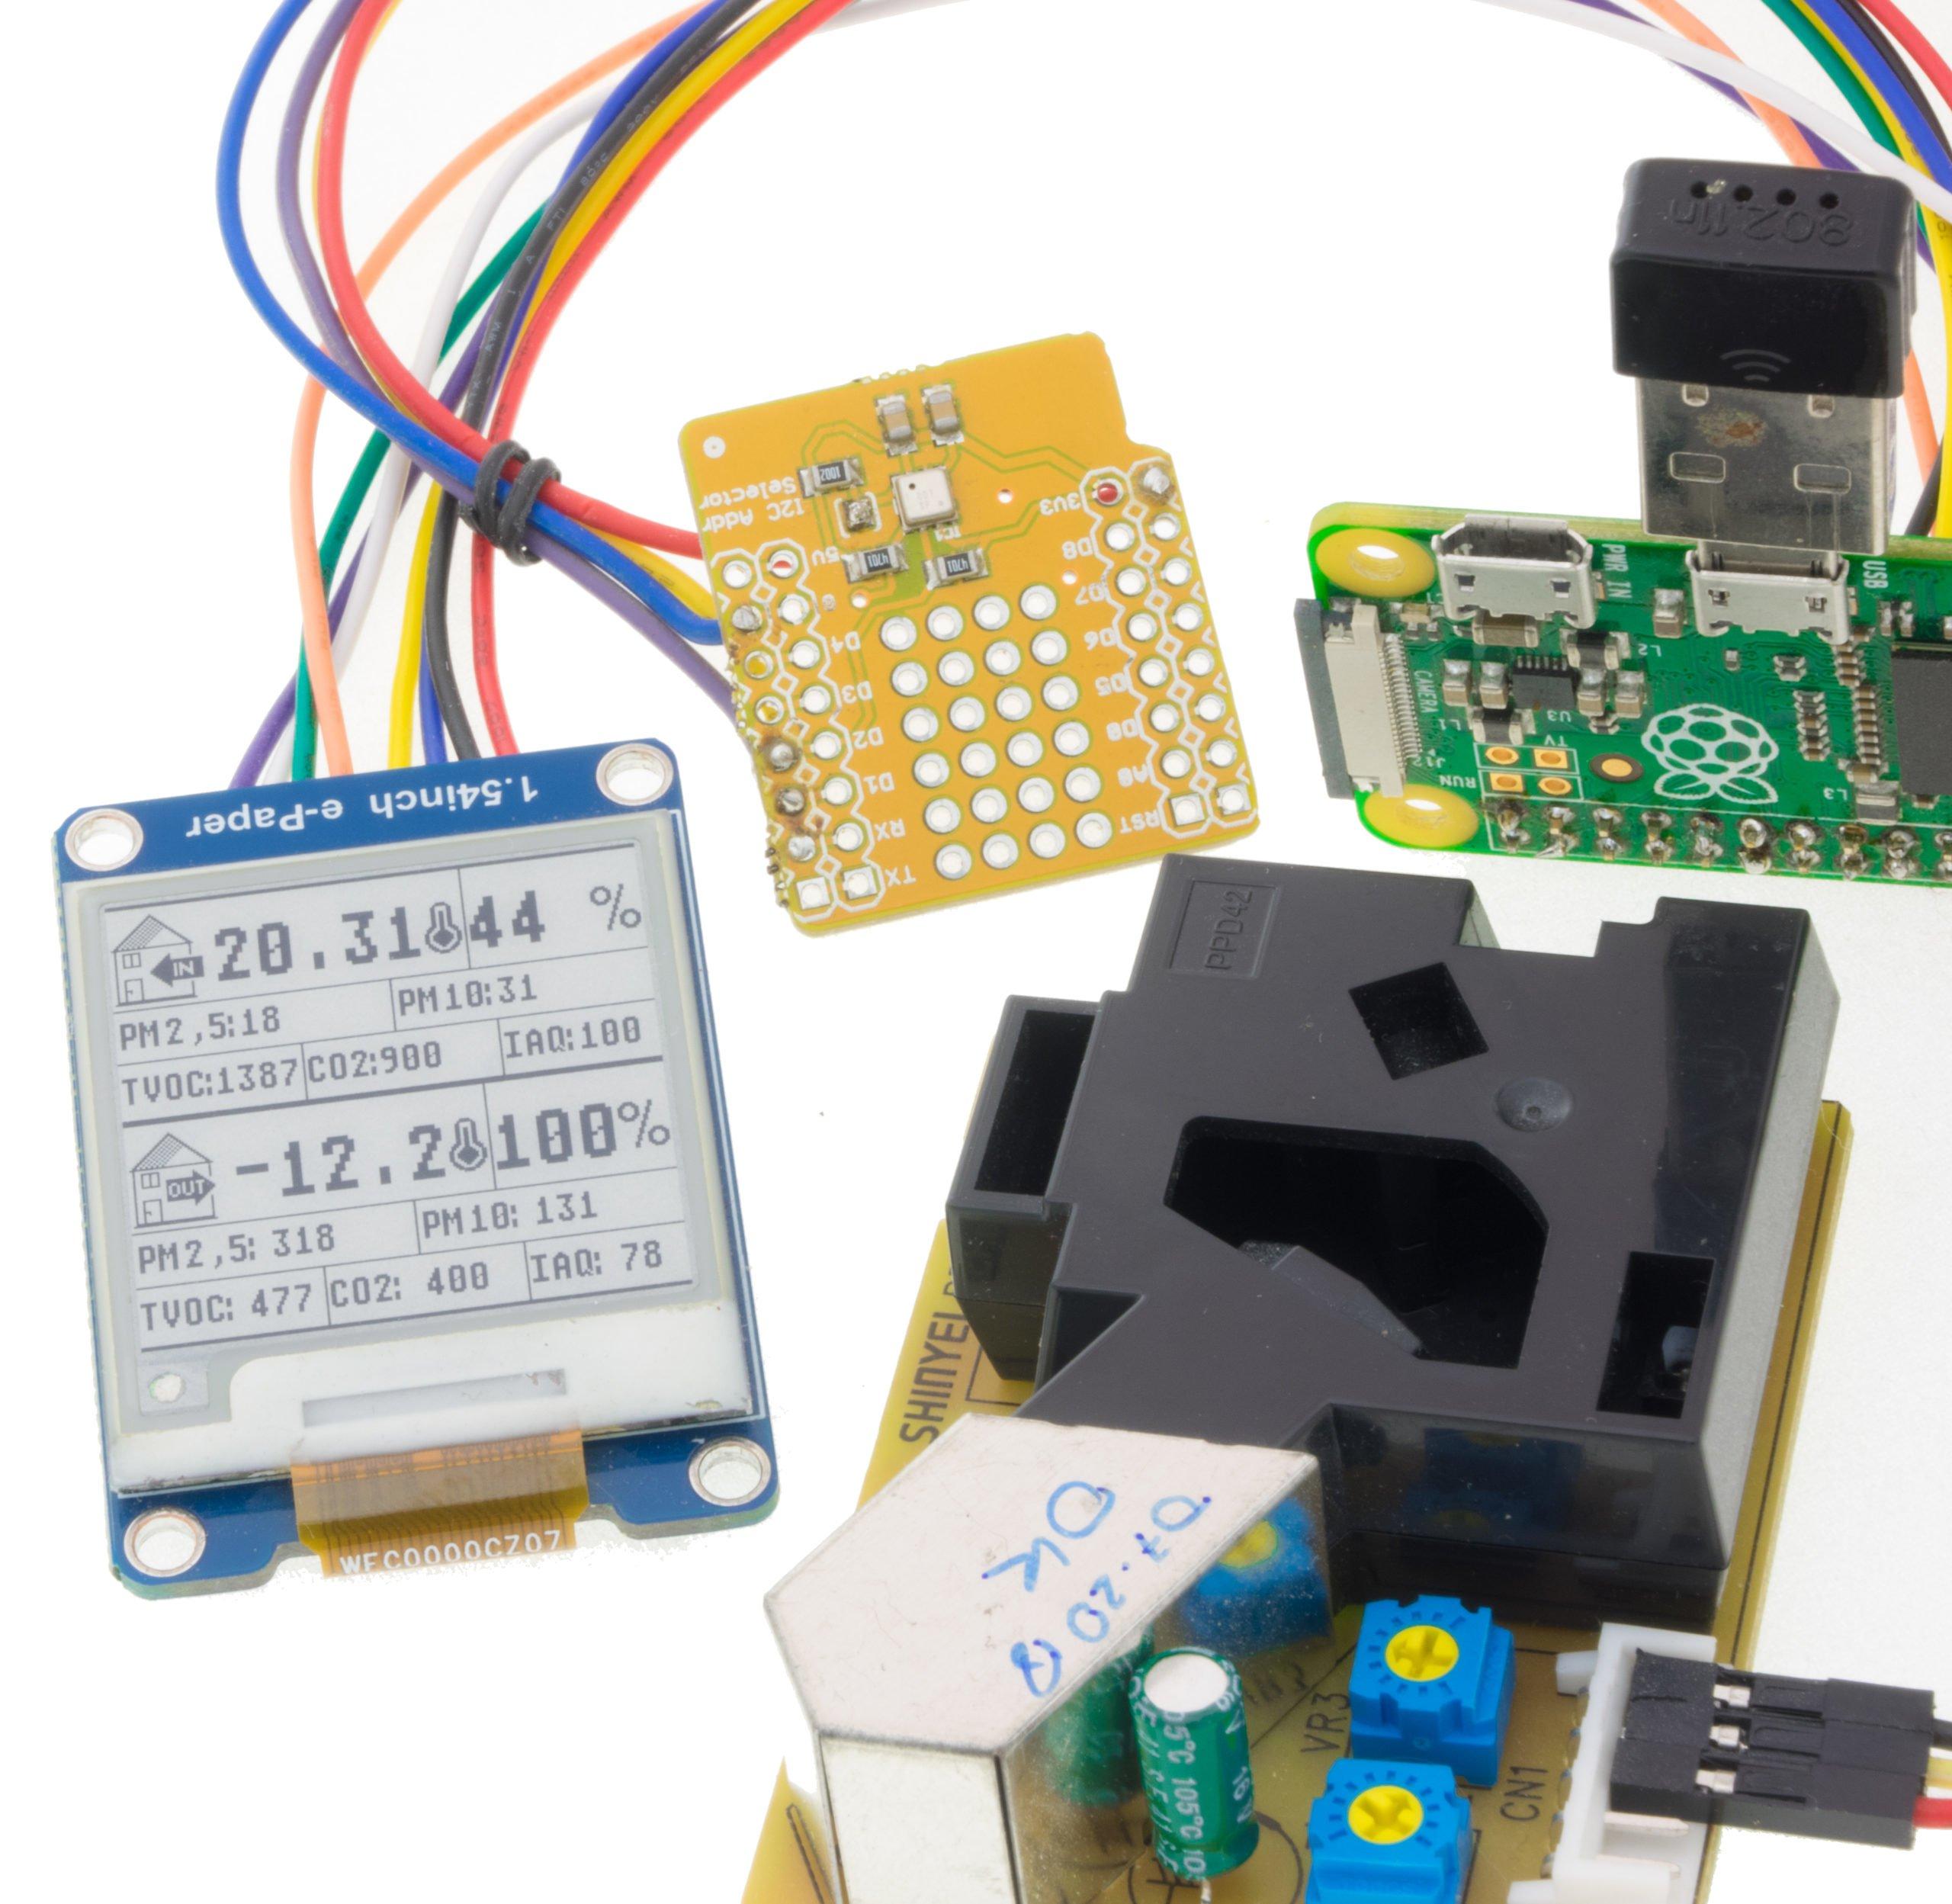 Raspberruy Pi Zero with ePaper and sensors